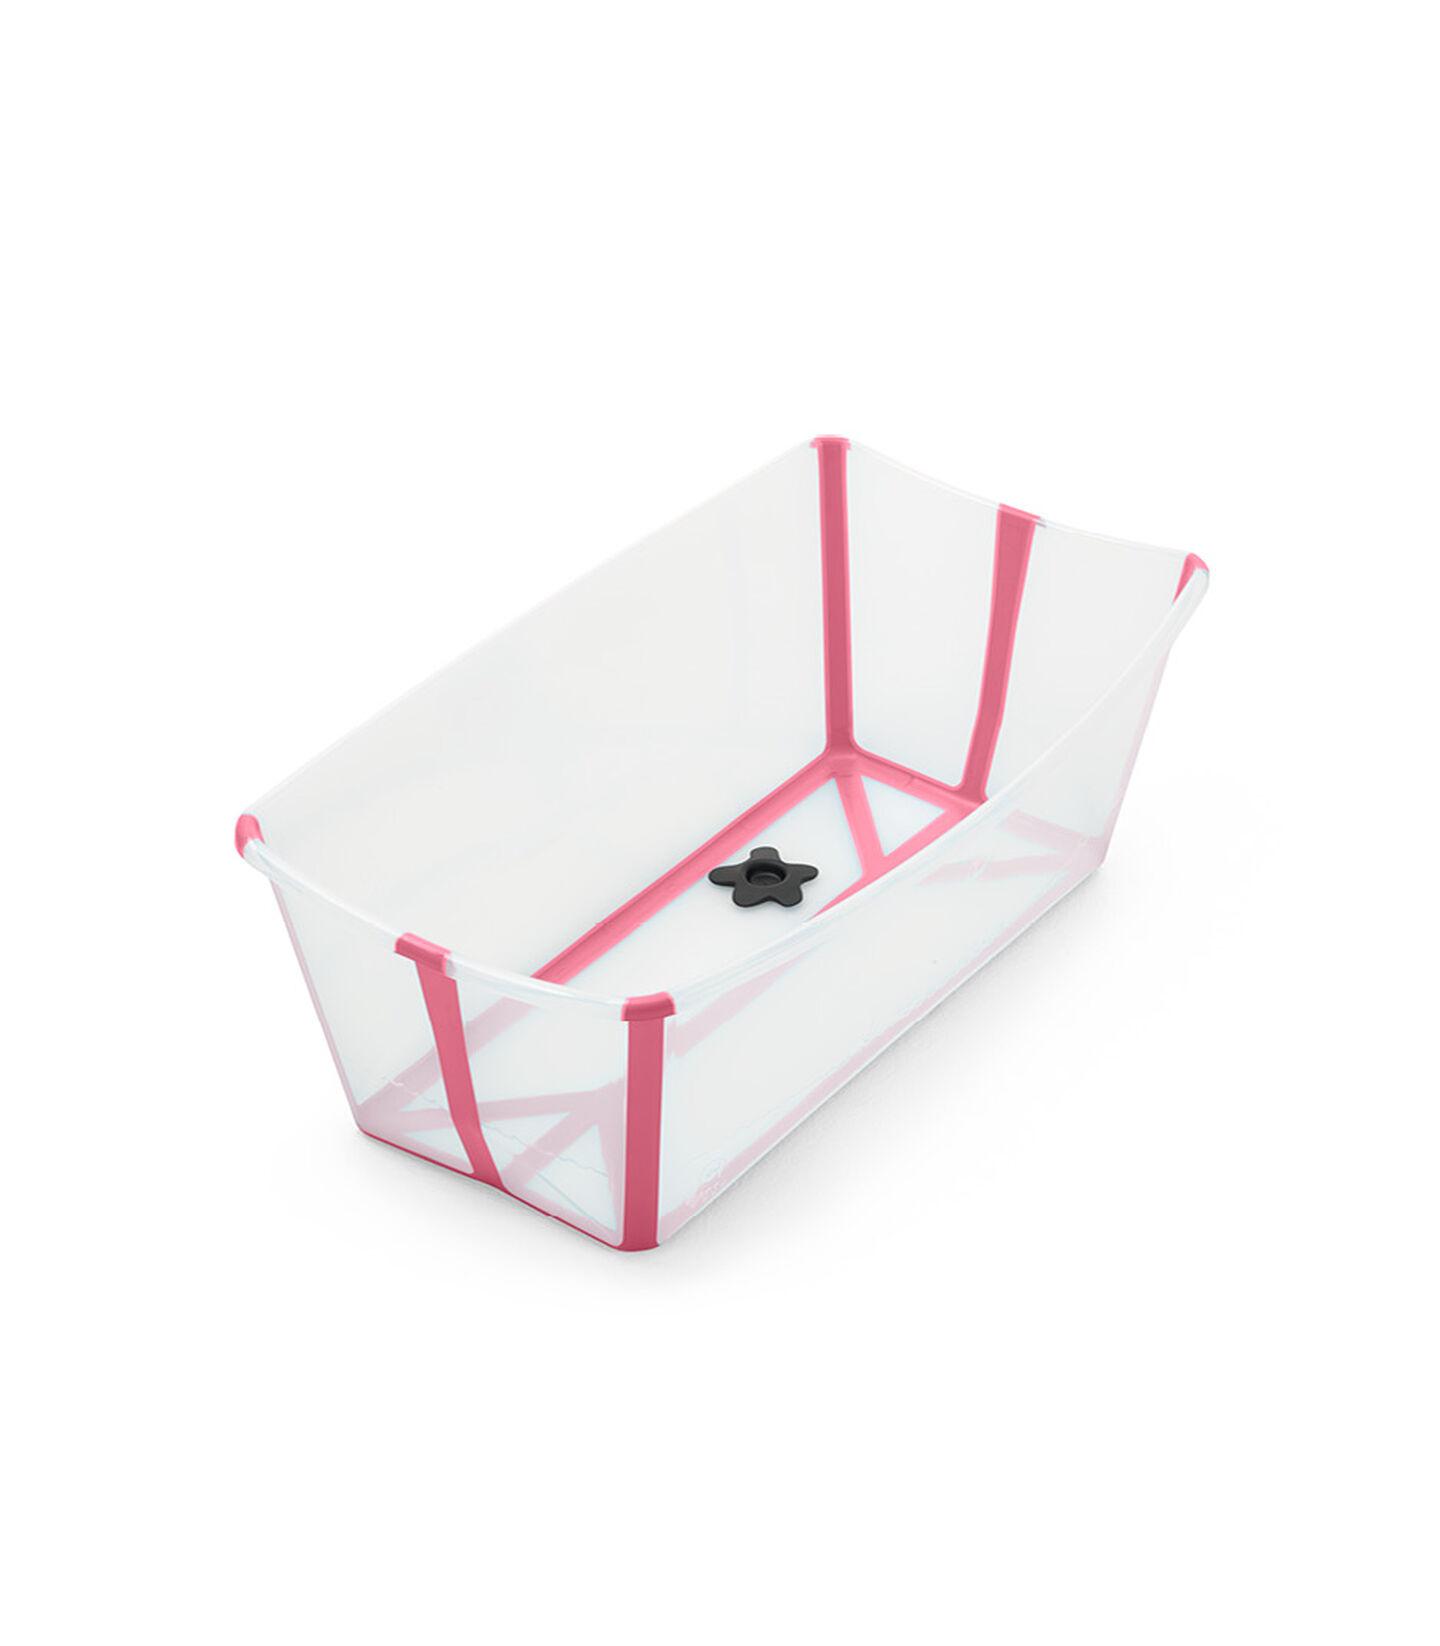 Stokke® Flexi Bath® Heat Trans Pink, Transparent Pink, mainview view 1